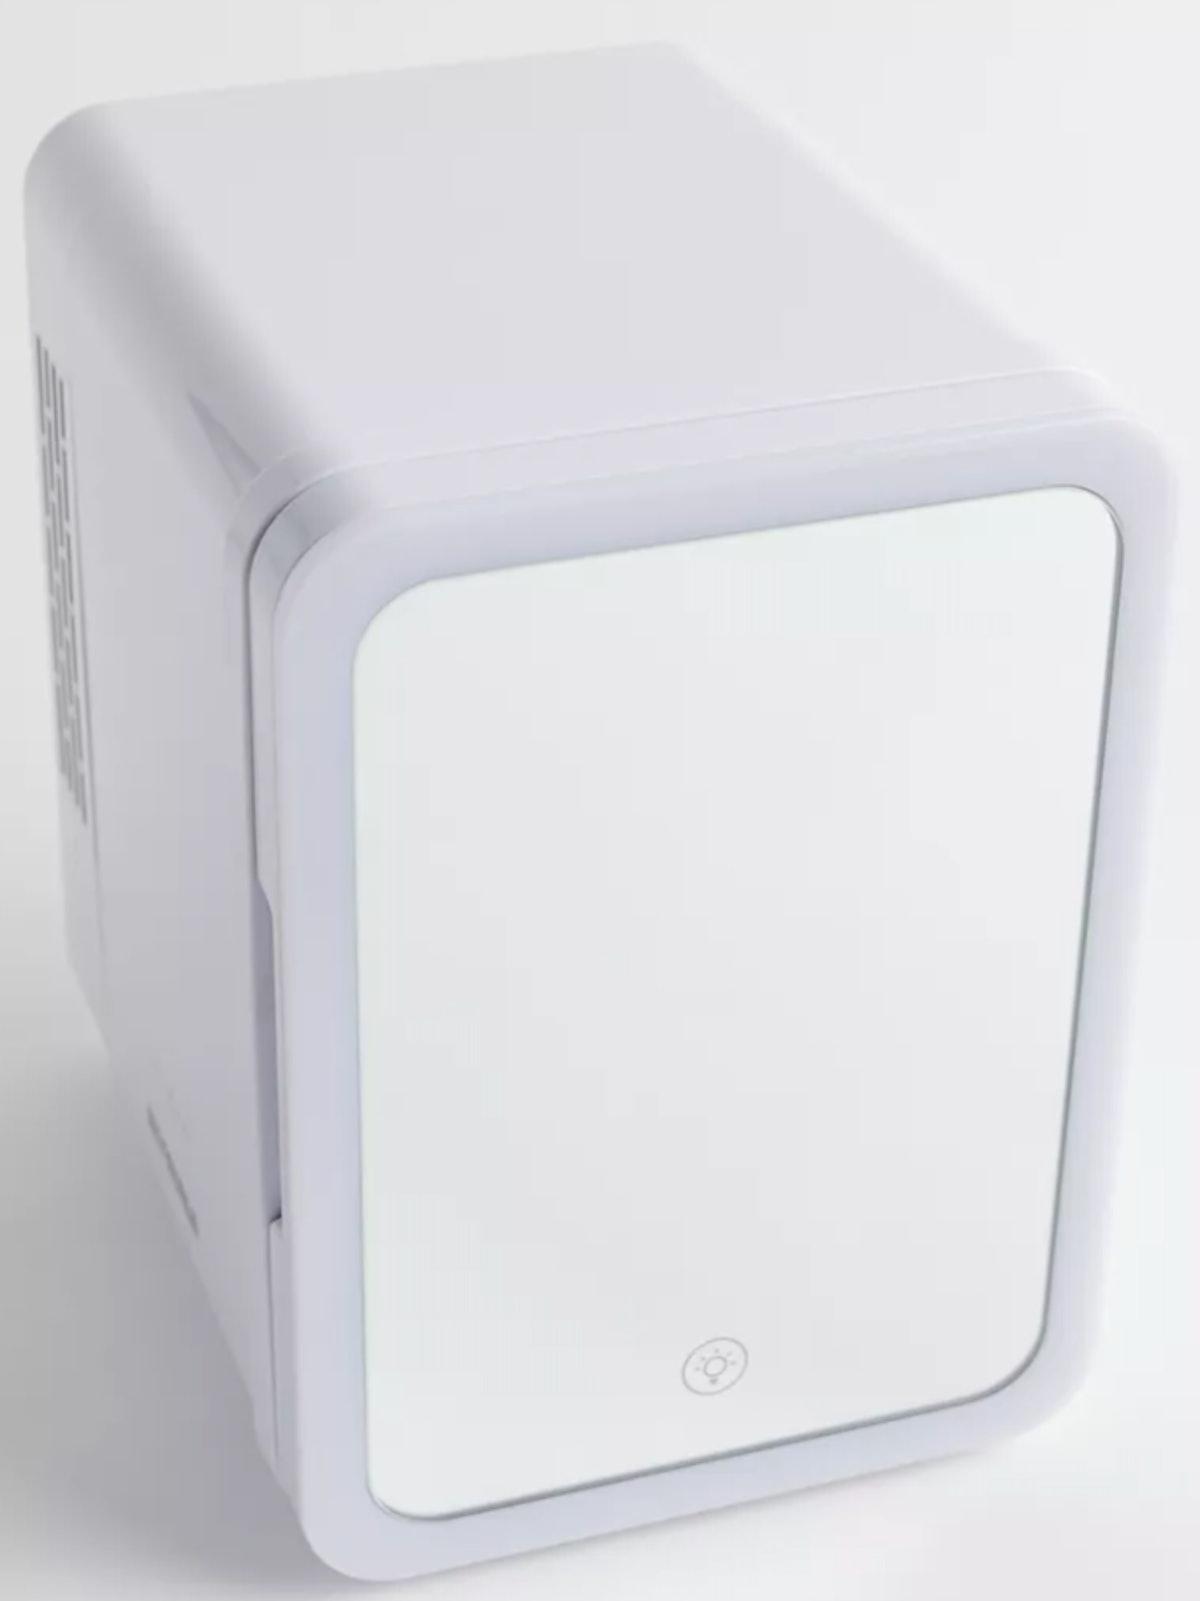 Revivify LED Mirror Beauty Fridge